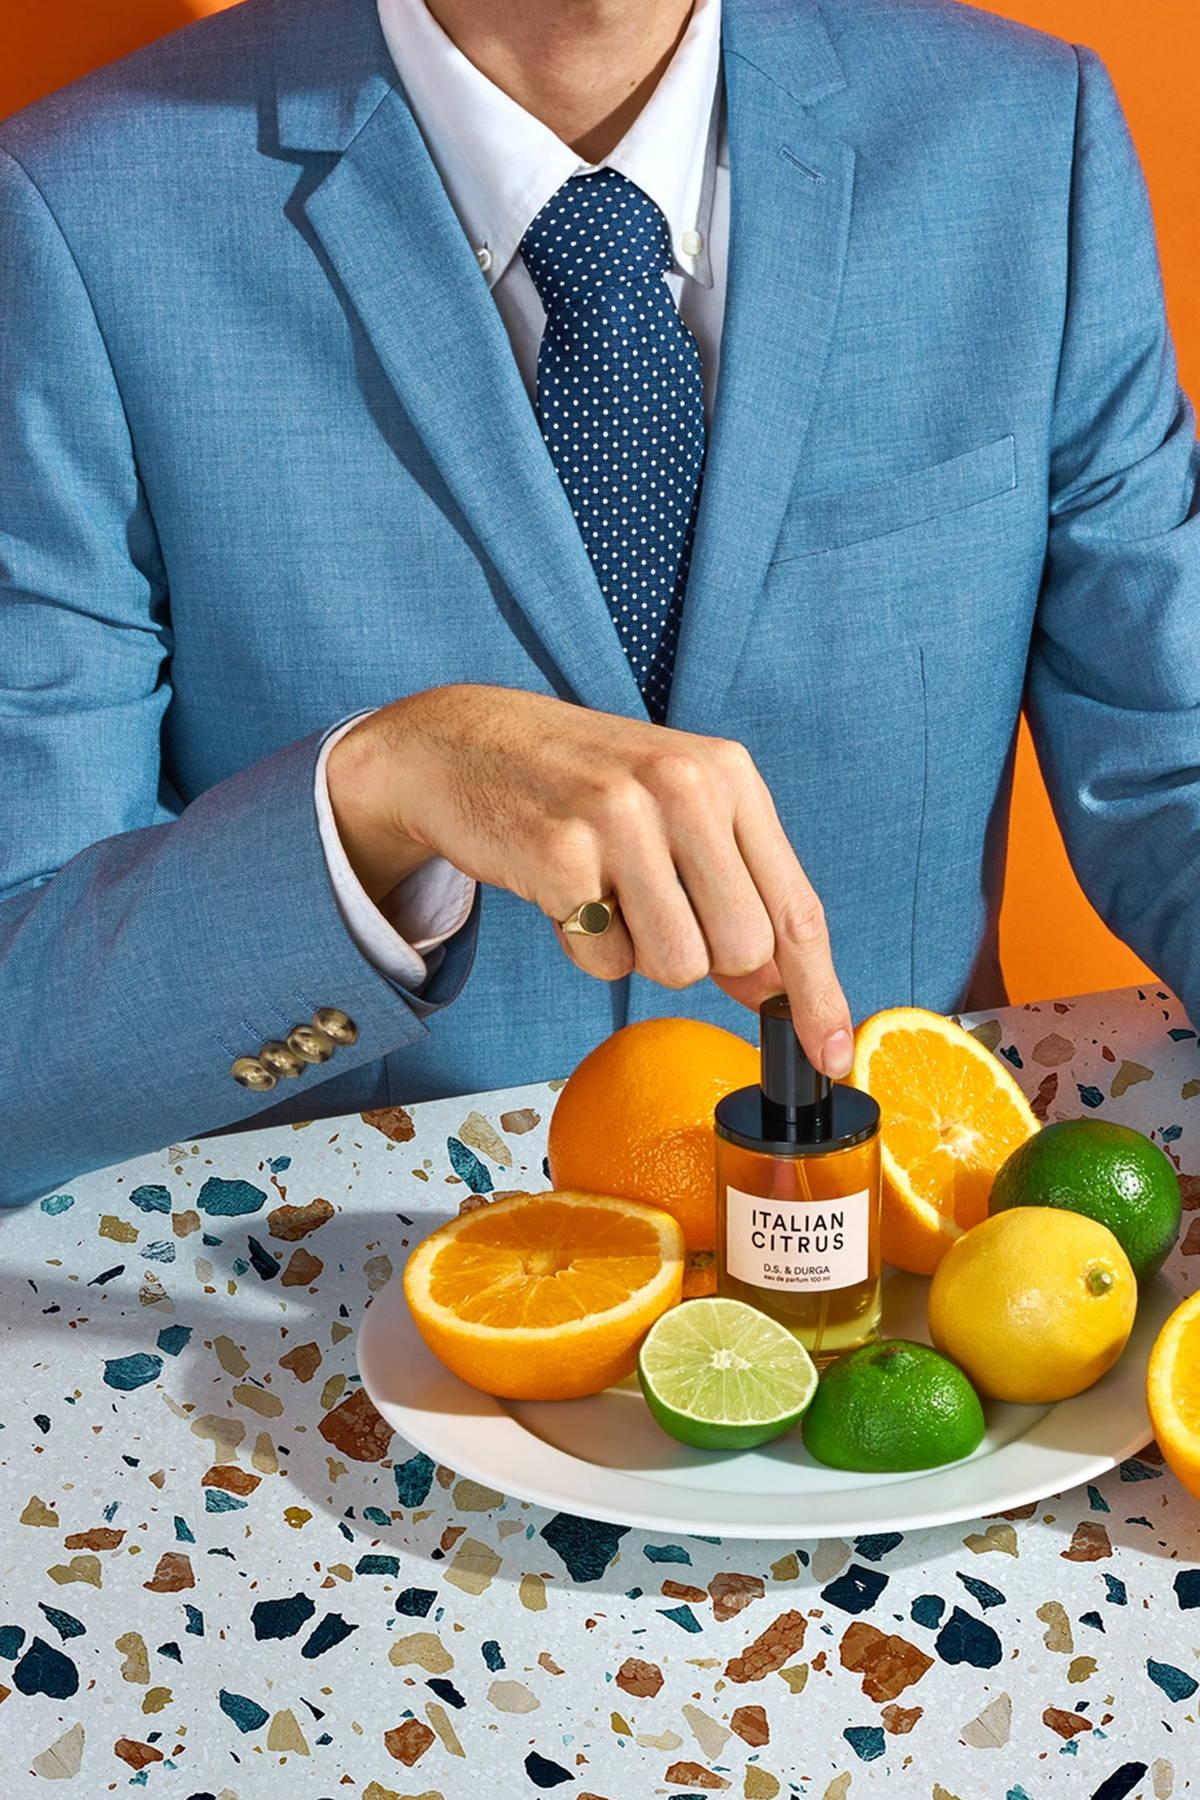 A photograph of Italian Citrus